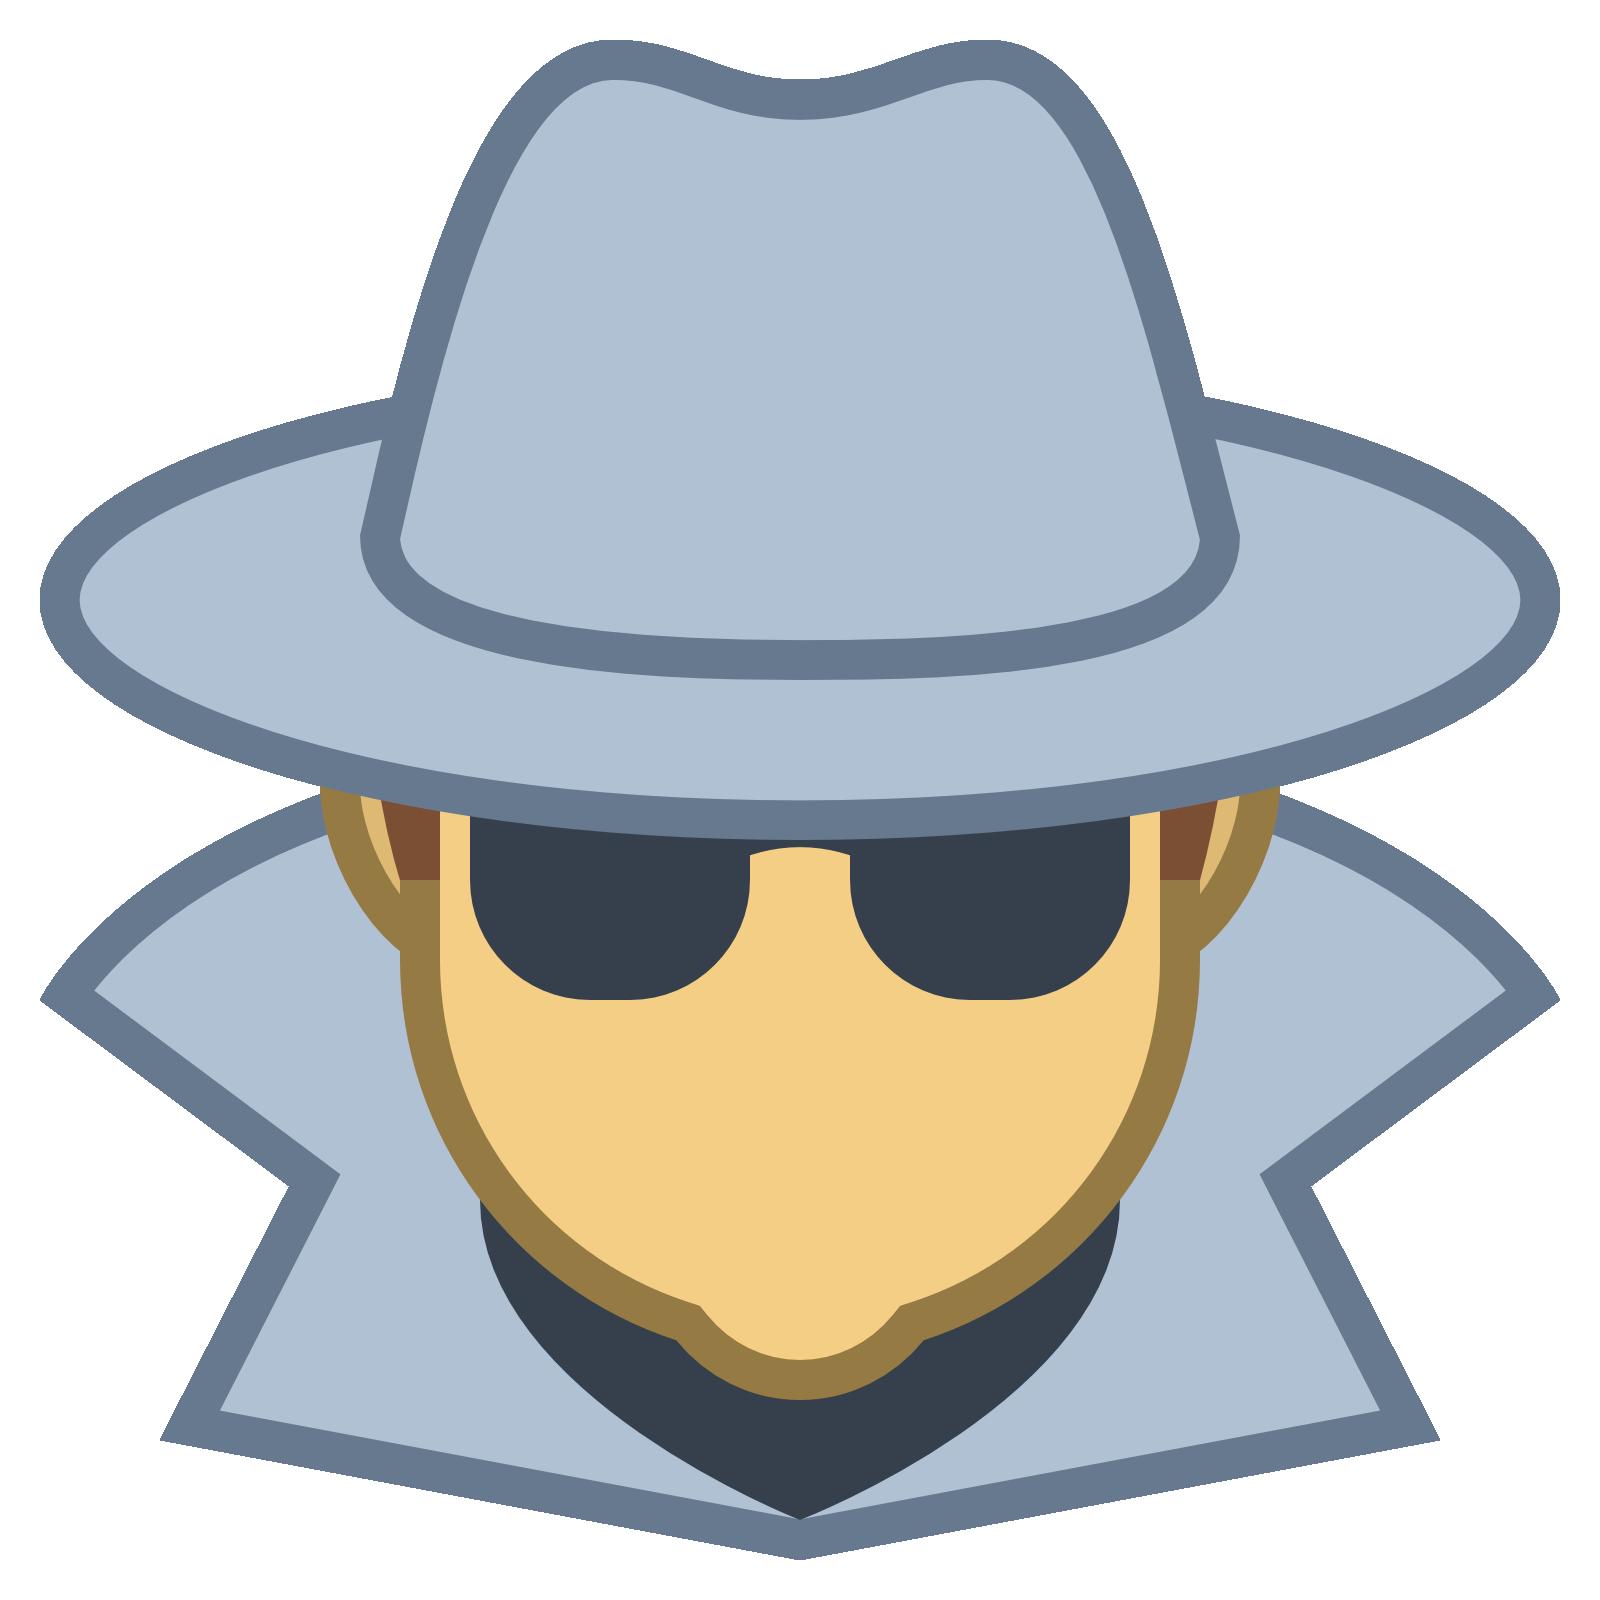 Fedora clipart spy hat. Mobile app spybunker cell